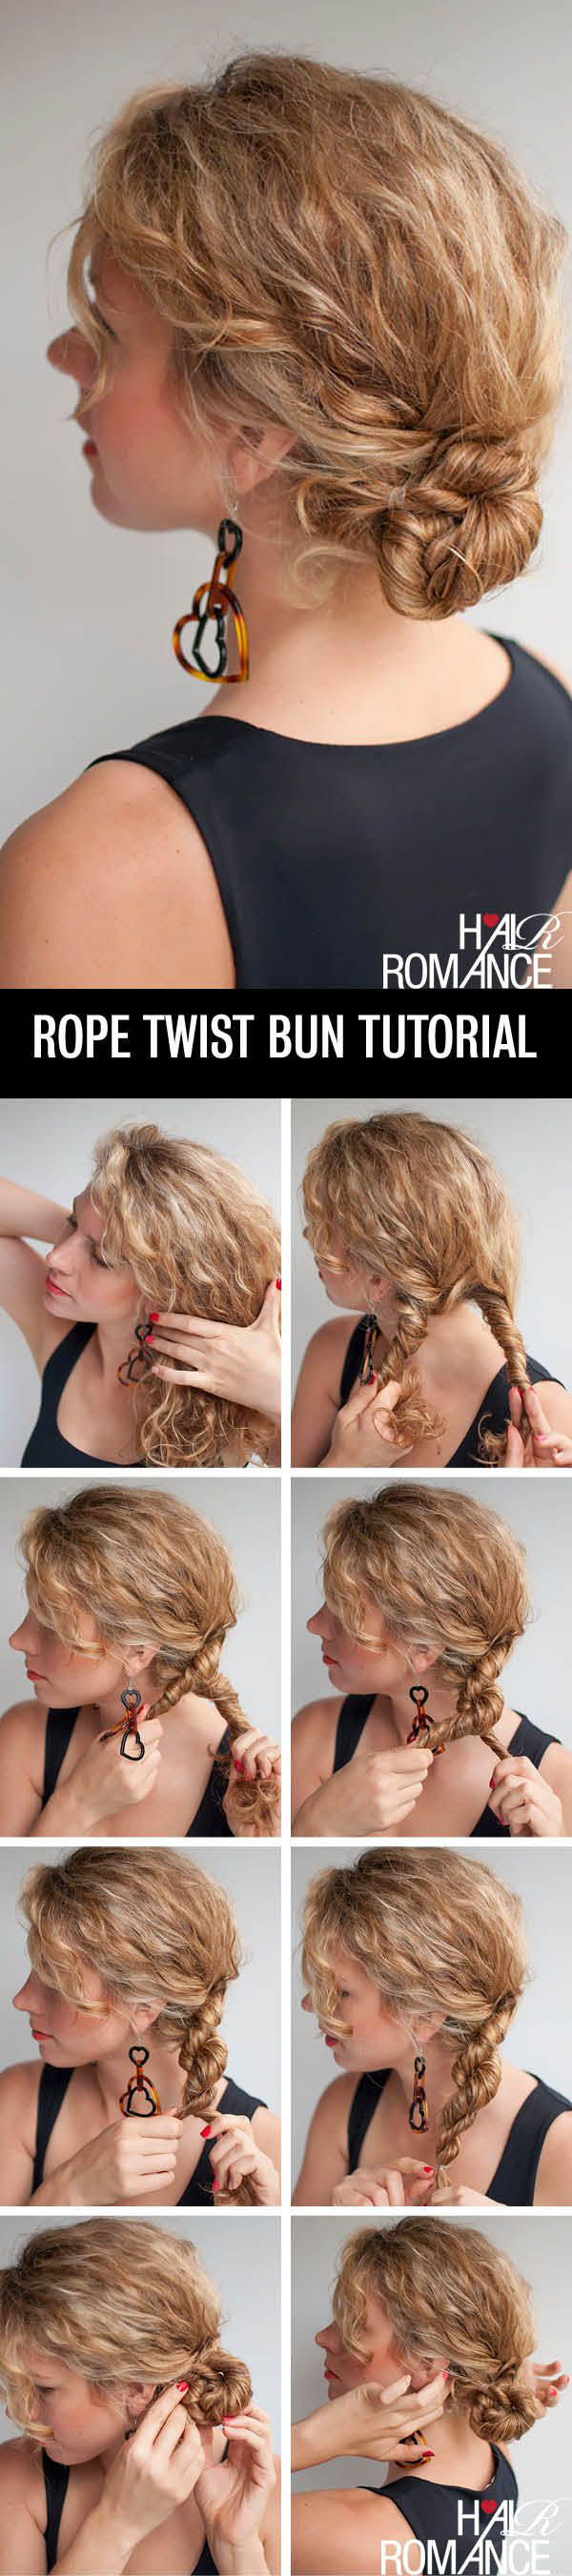 Bun Hairstyles 4